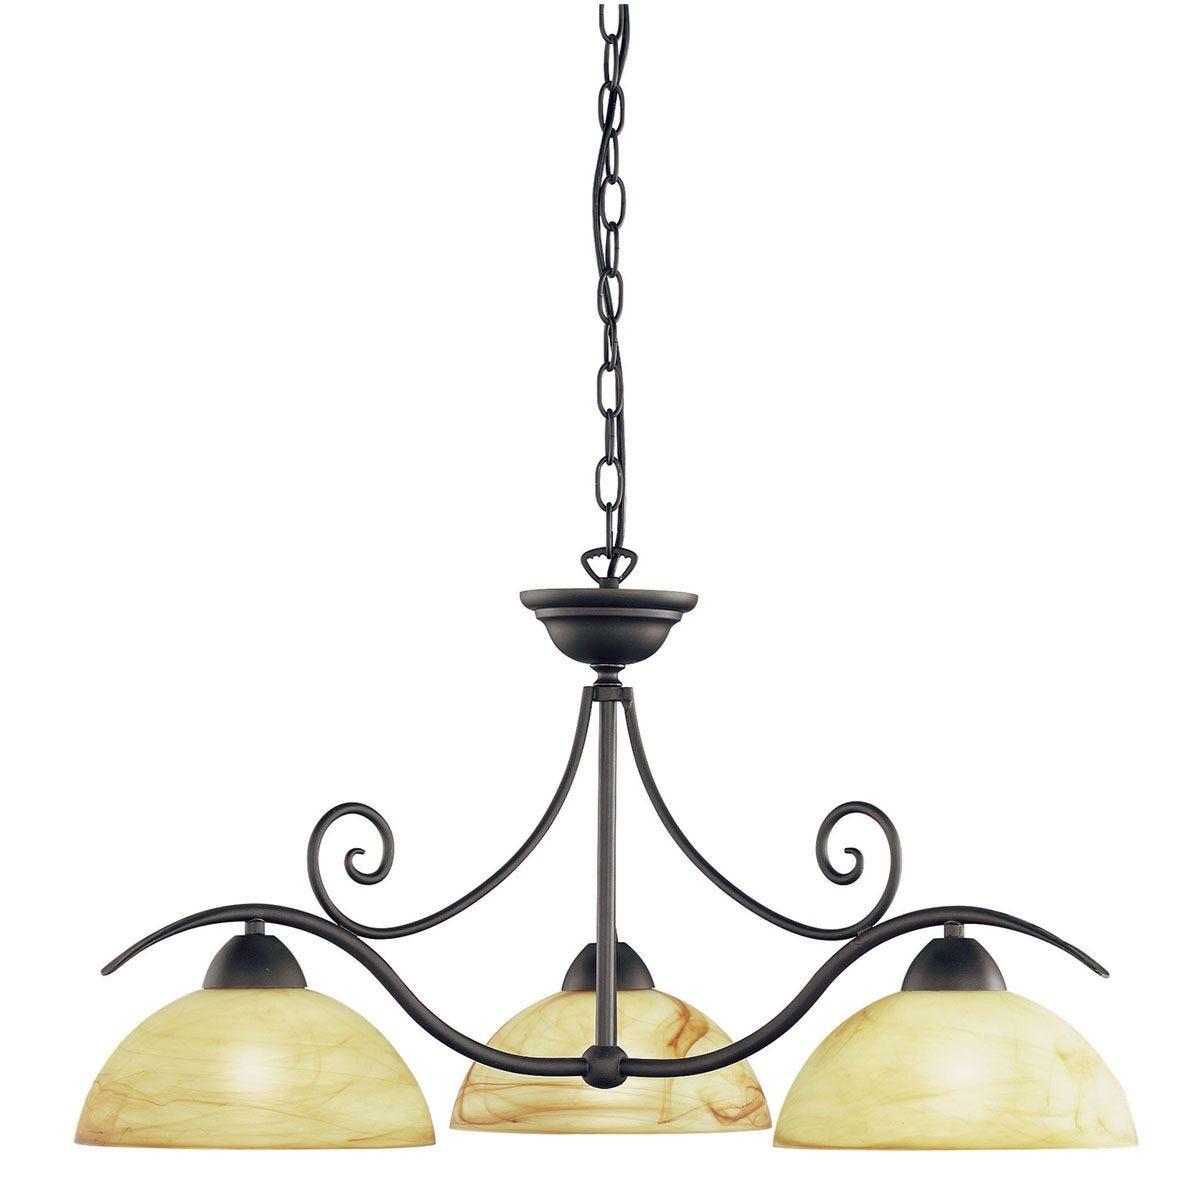 Wofi Lacchino 3-Light Pendant Lamp - Antique Brown